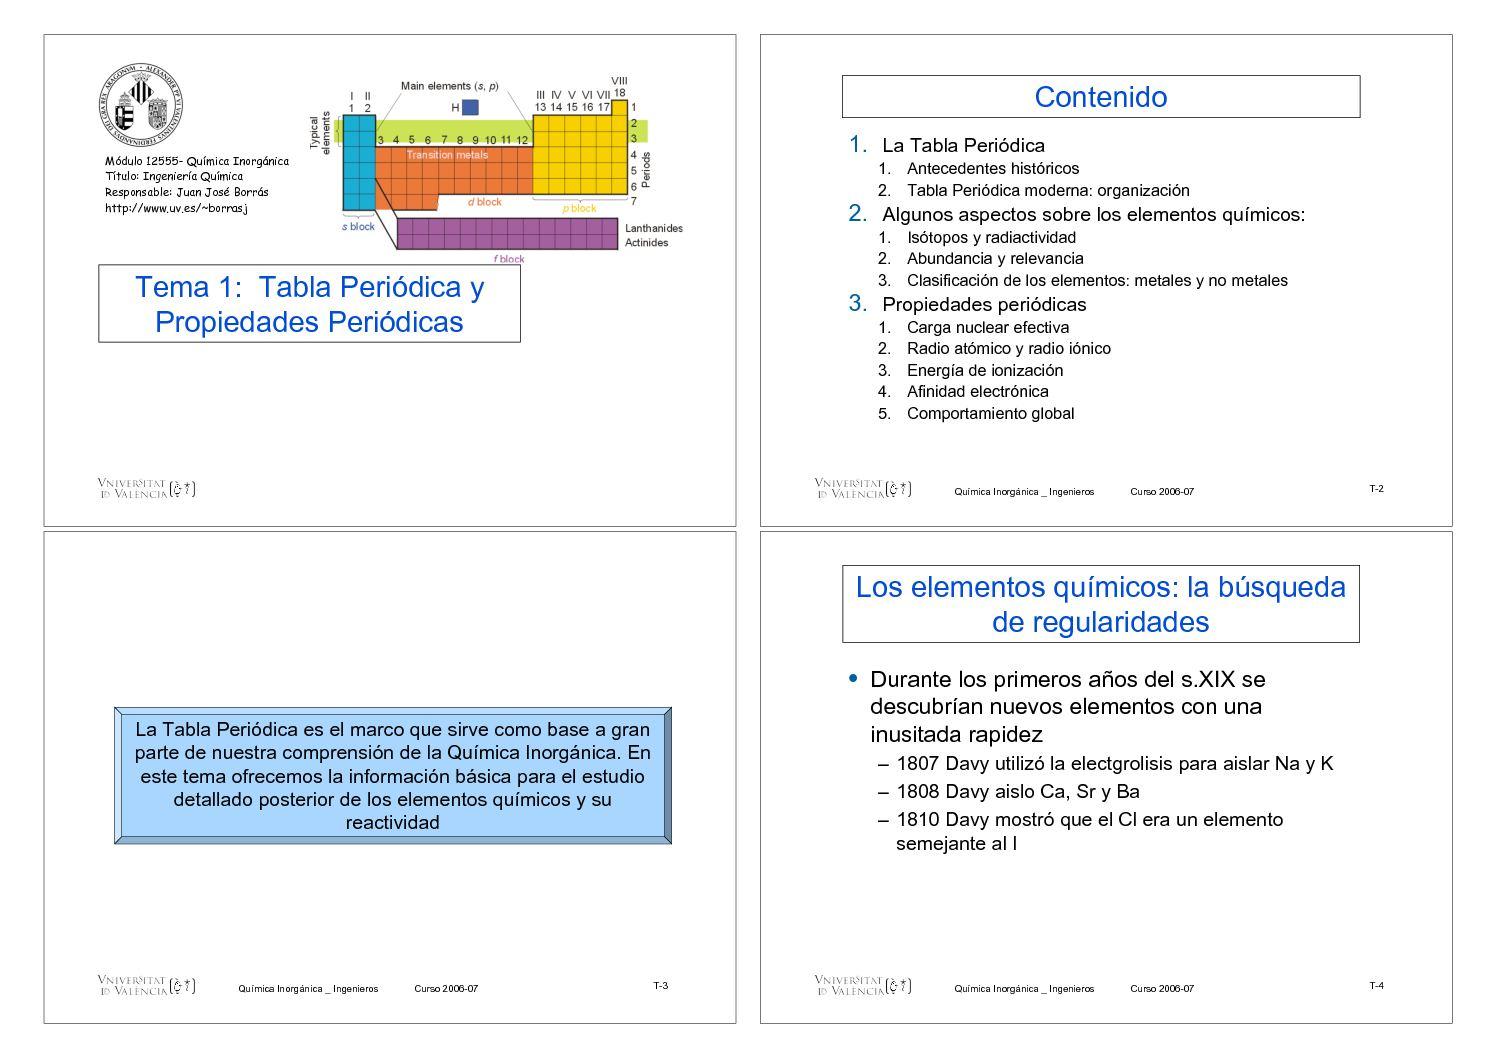 Calamo propiedades quimicas de la tabla periodica urtaz Images